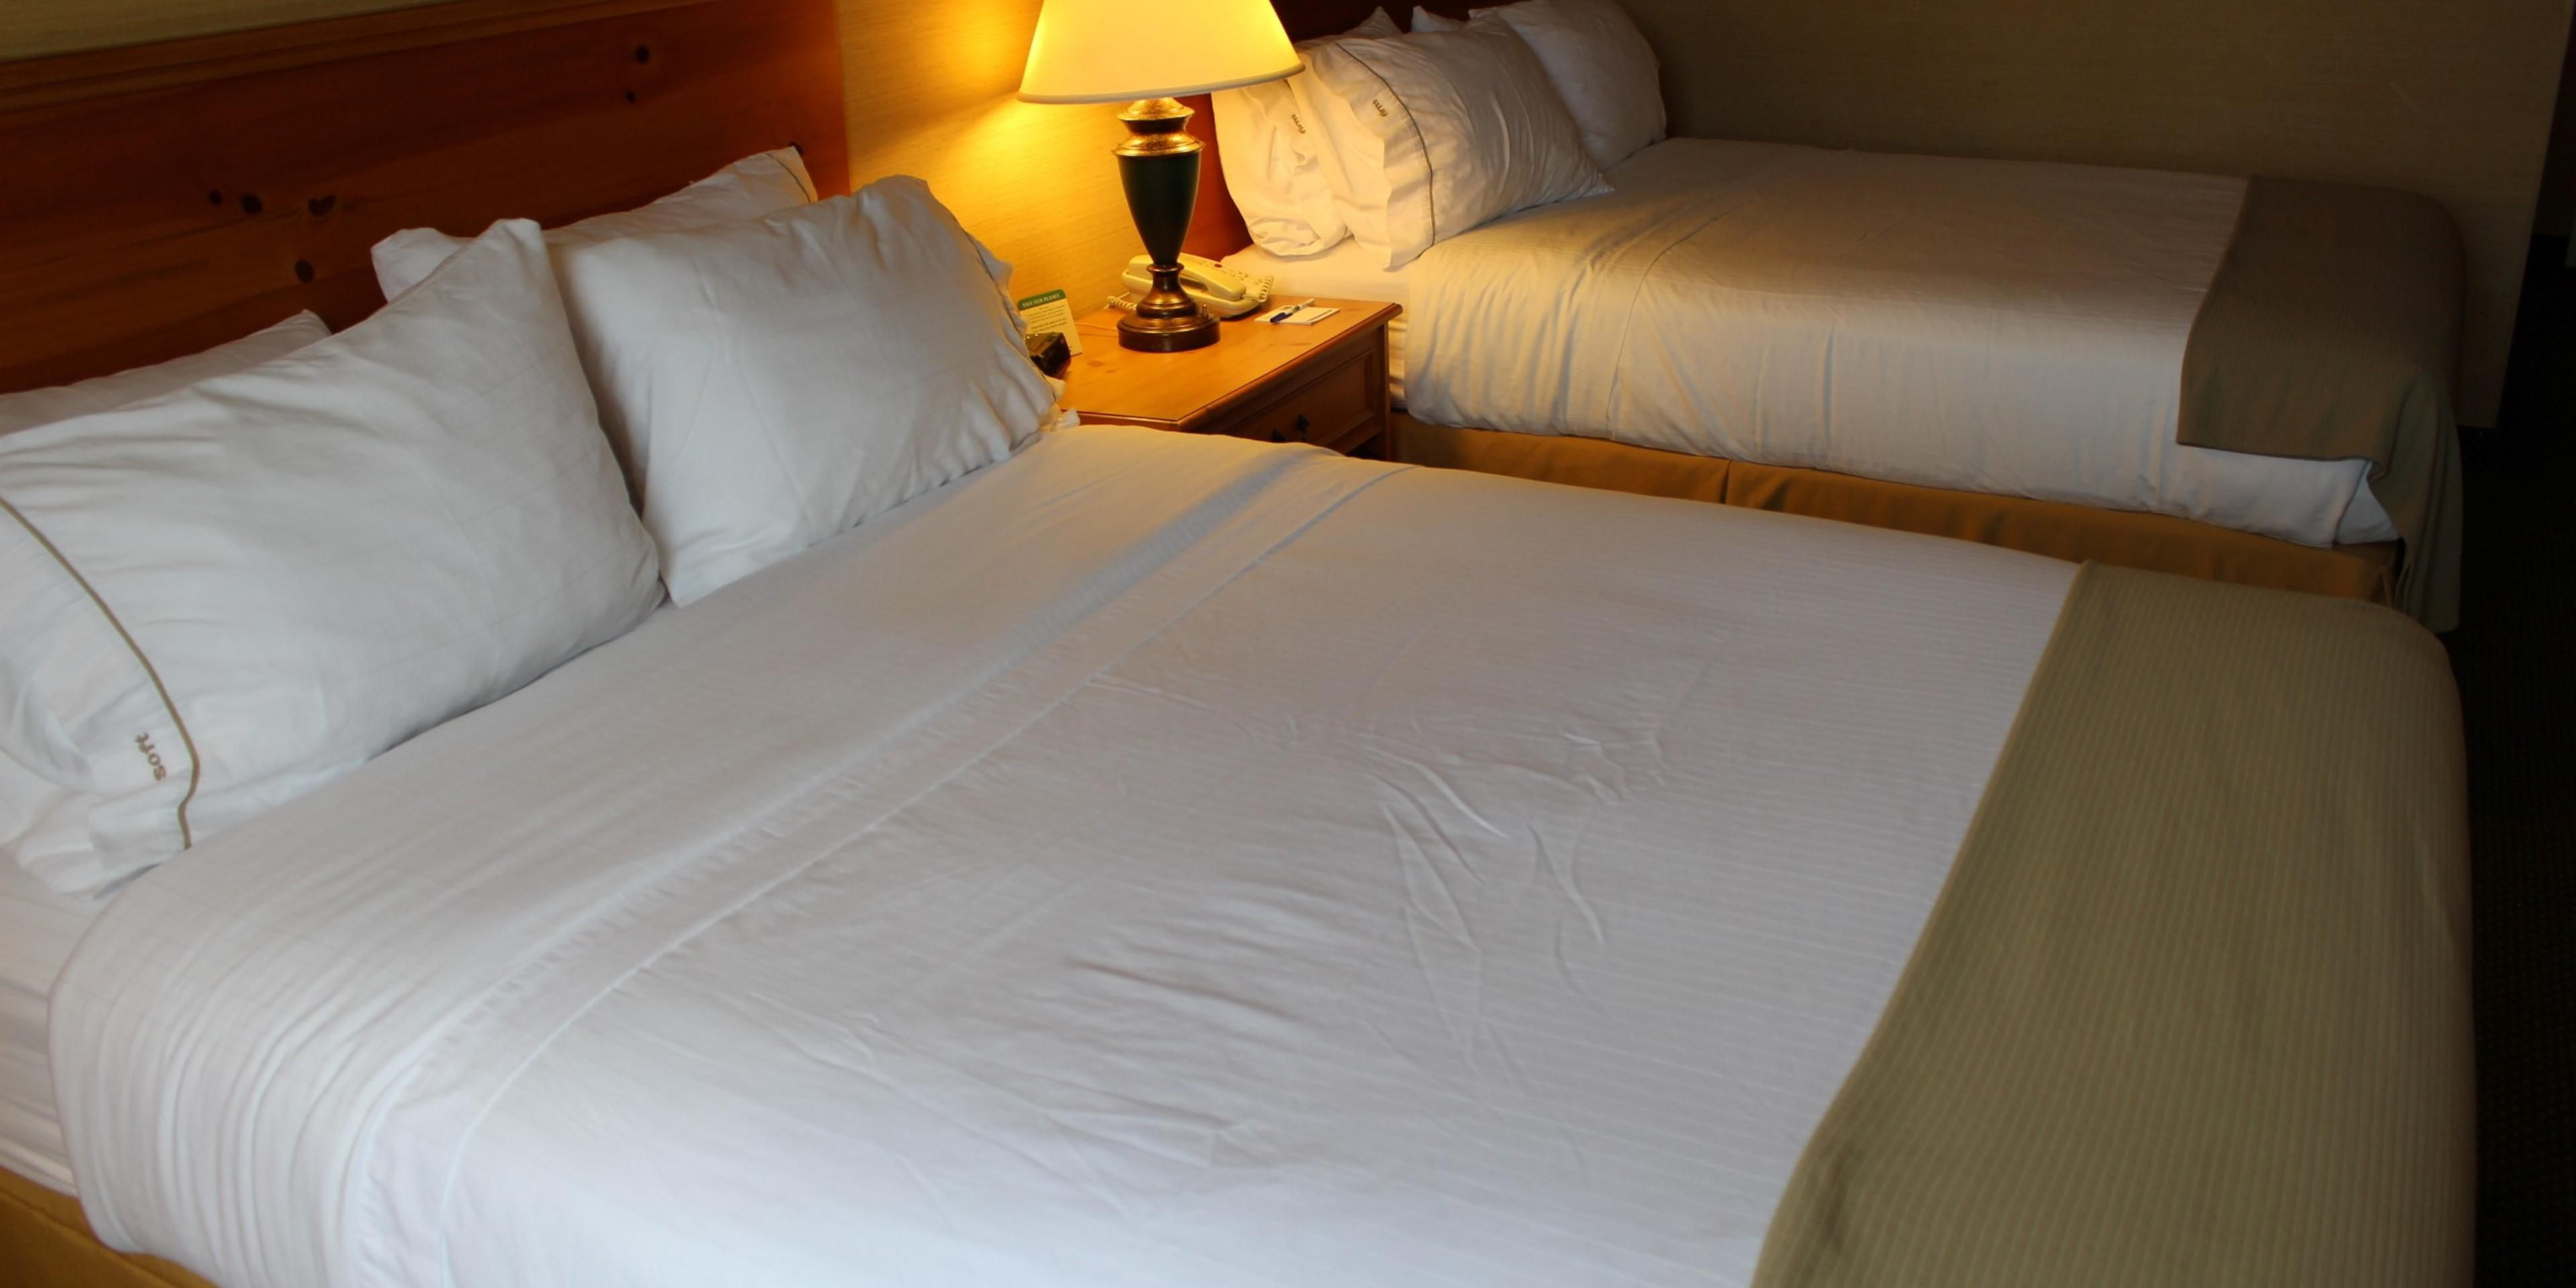 Holiday Inn Express & Suites Warrenton Hotel by IHG